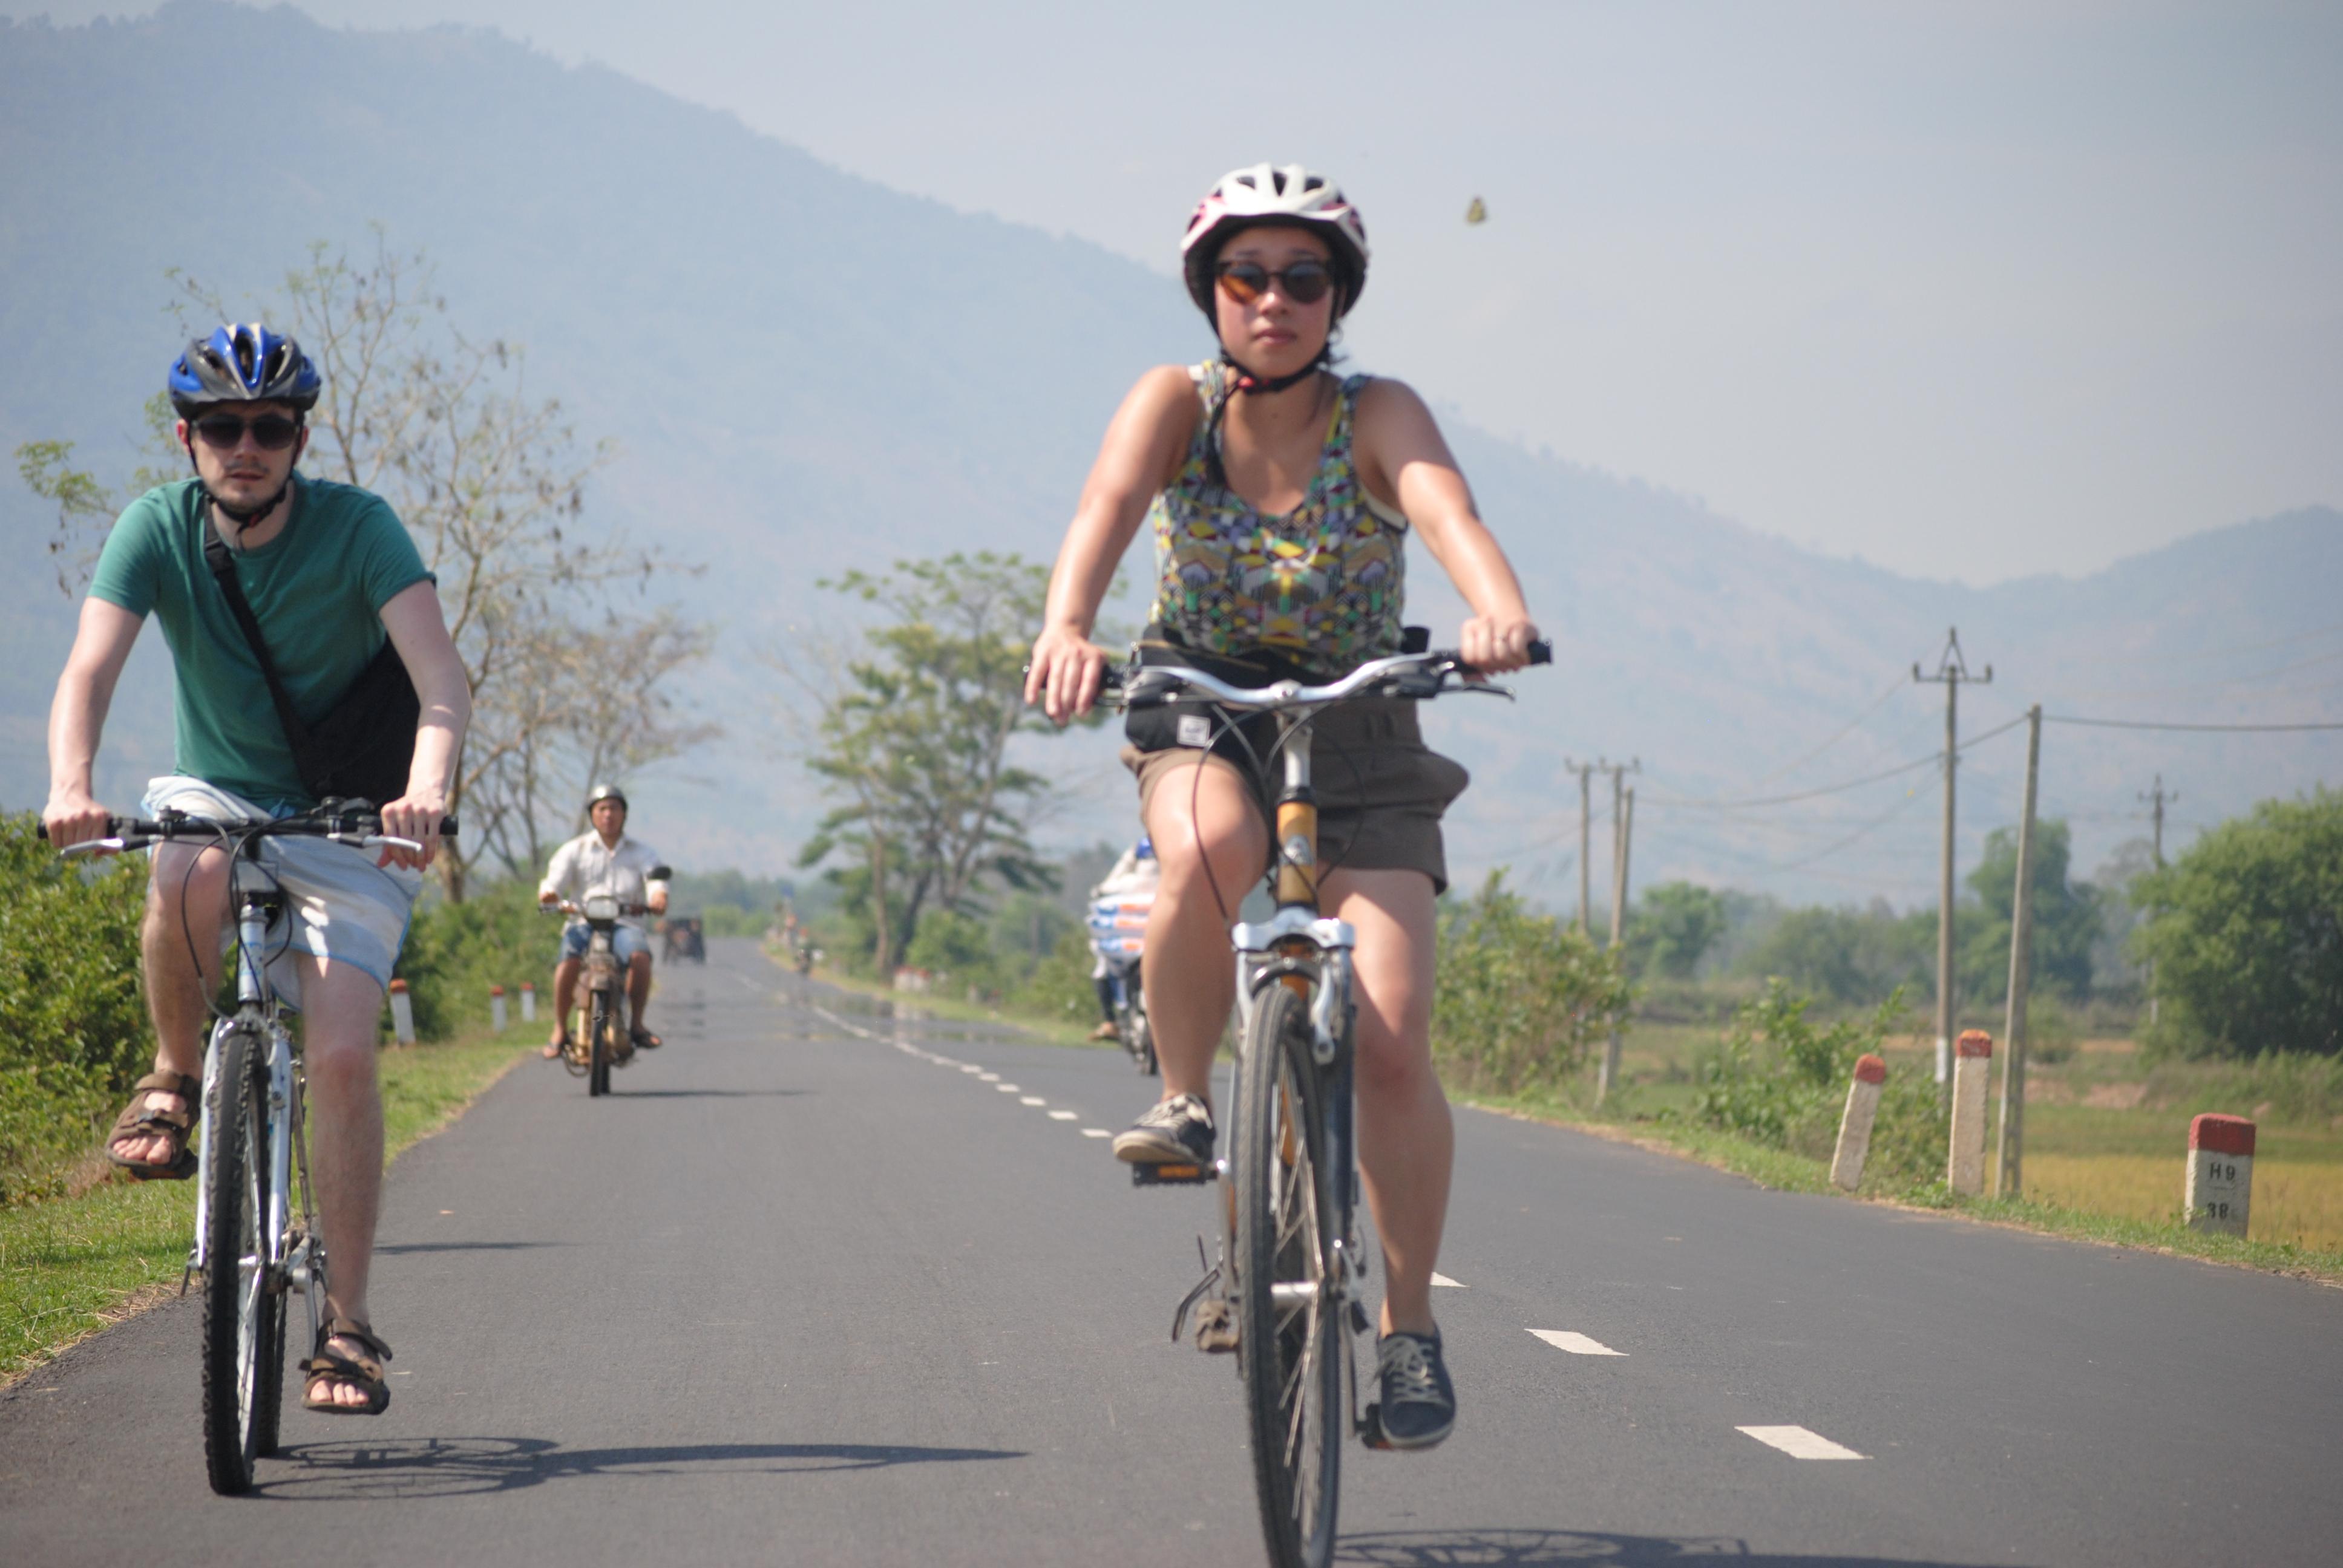 A Solo trip in Vietnam